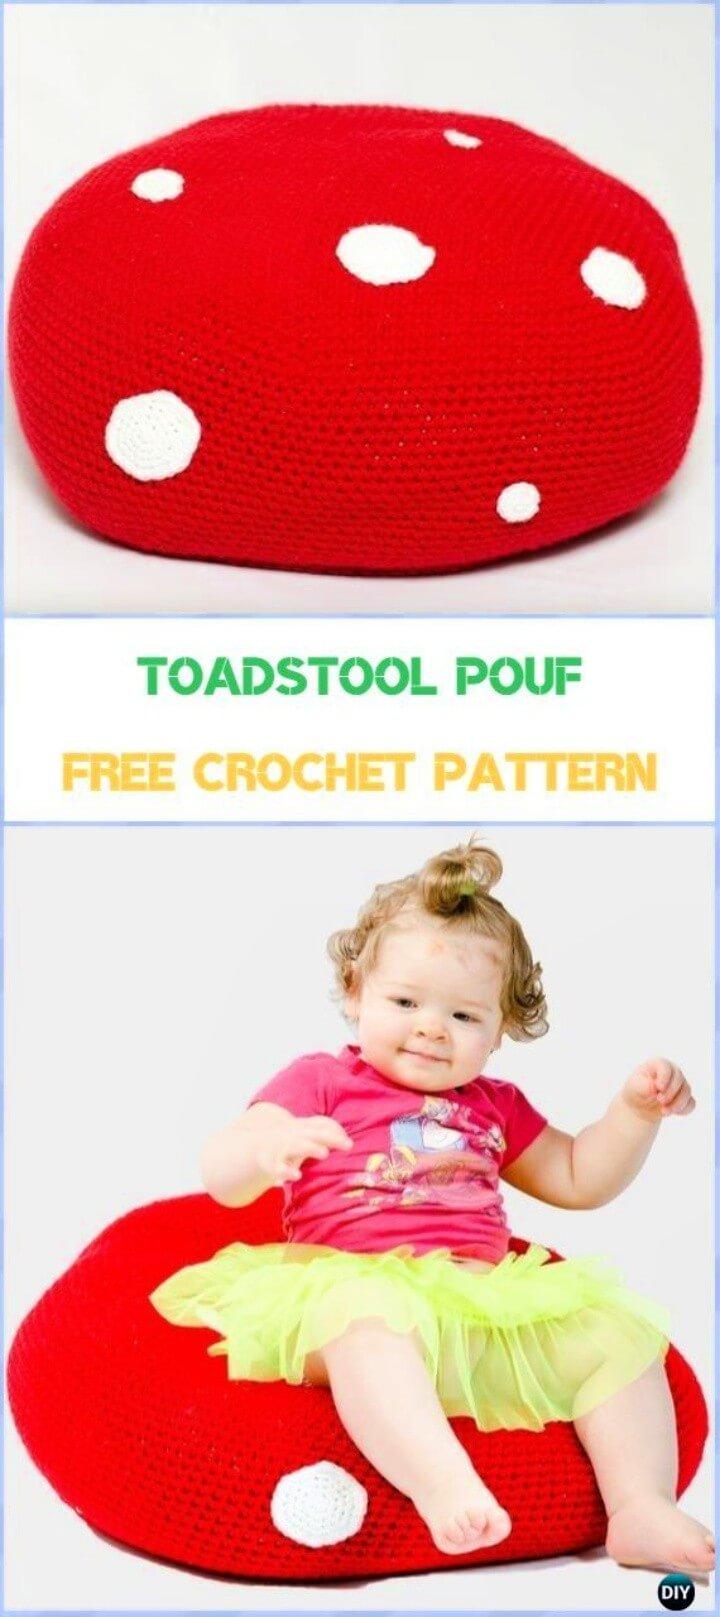 Toadstool Pouf